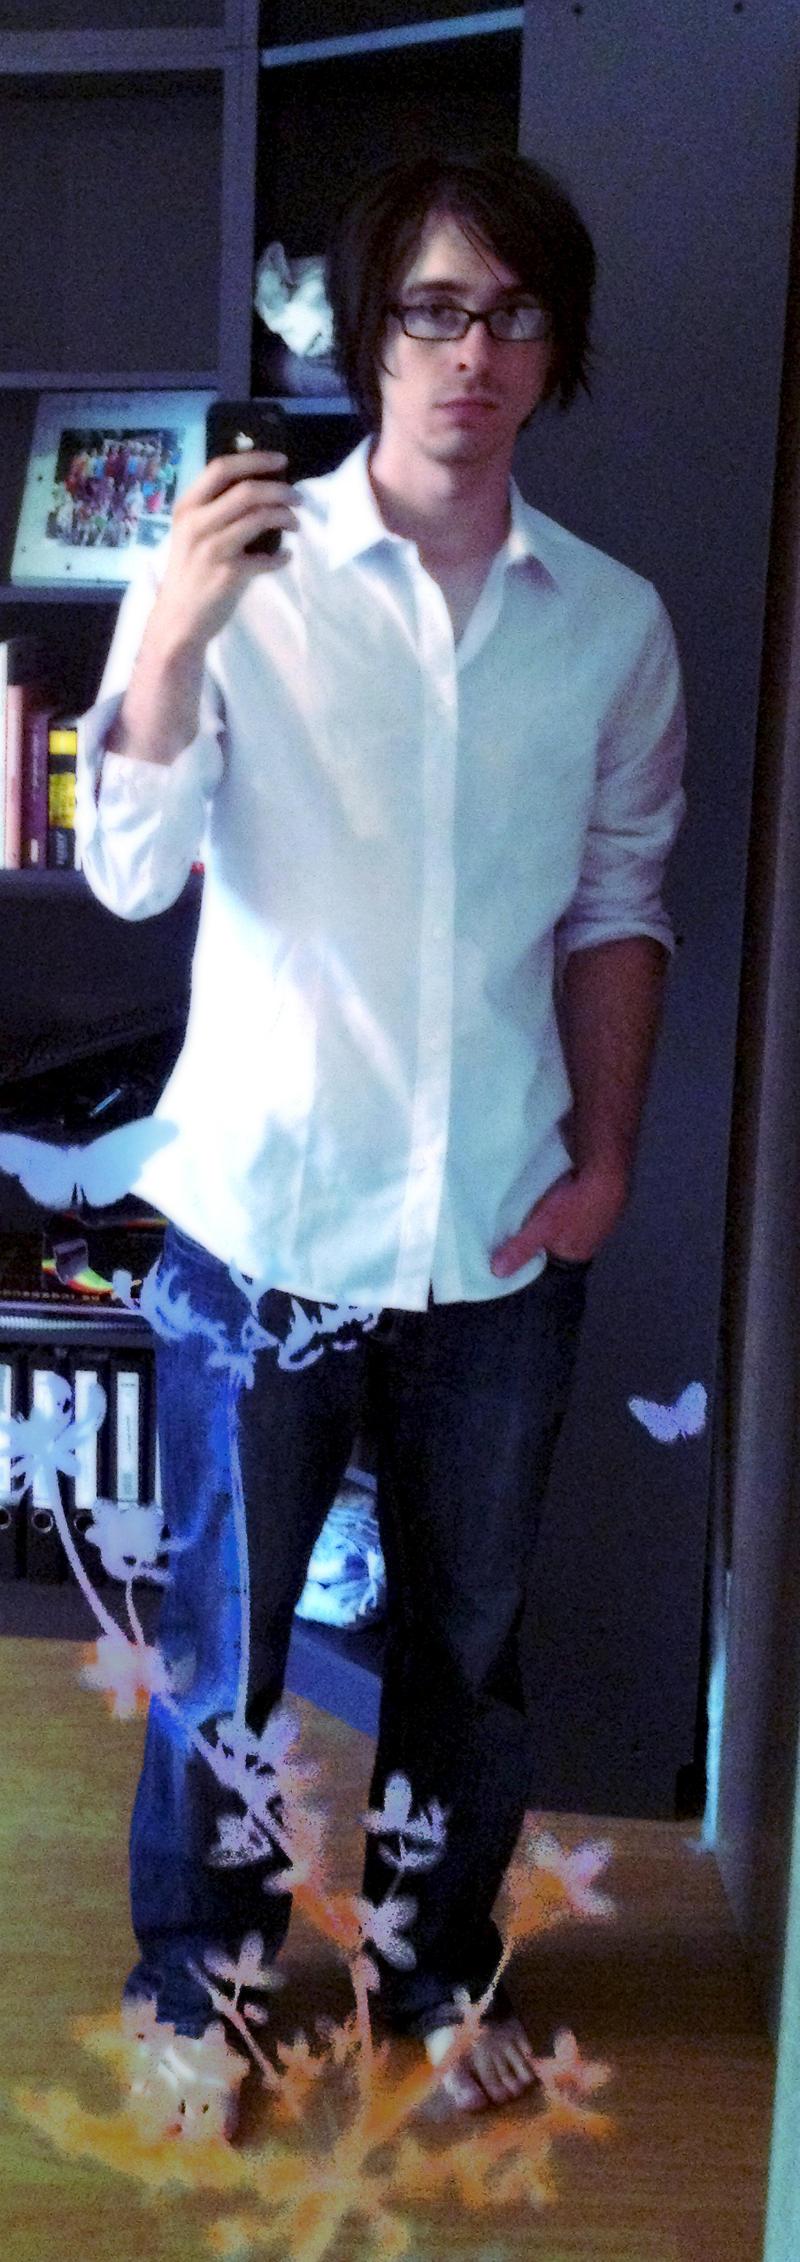 Lykaner89's Profile Picture